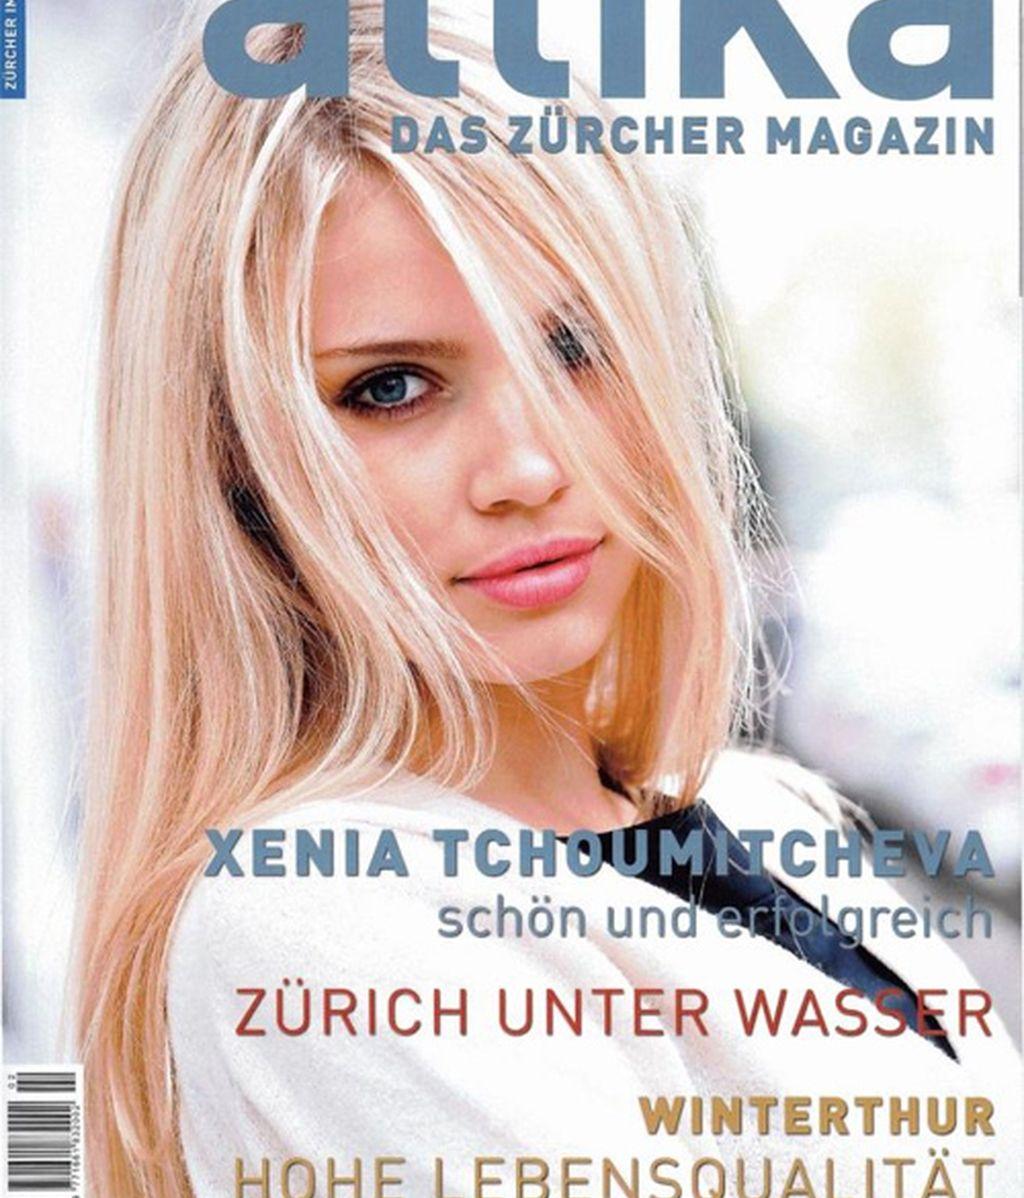 Xenia Tchoumitcheva en 13 pinceladas